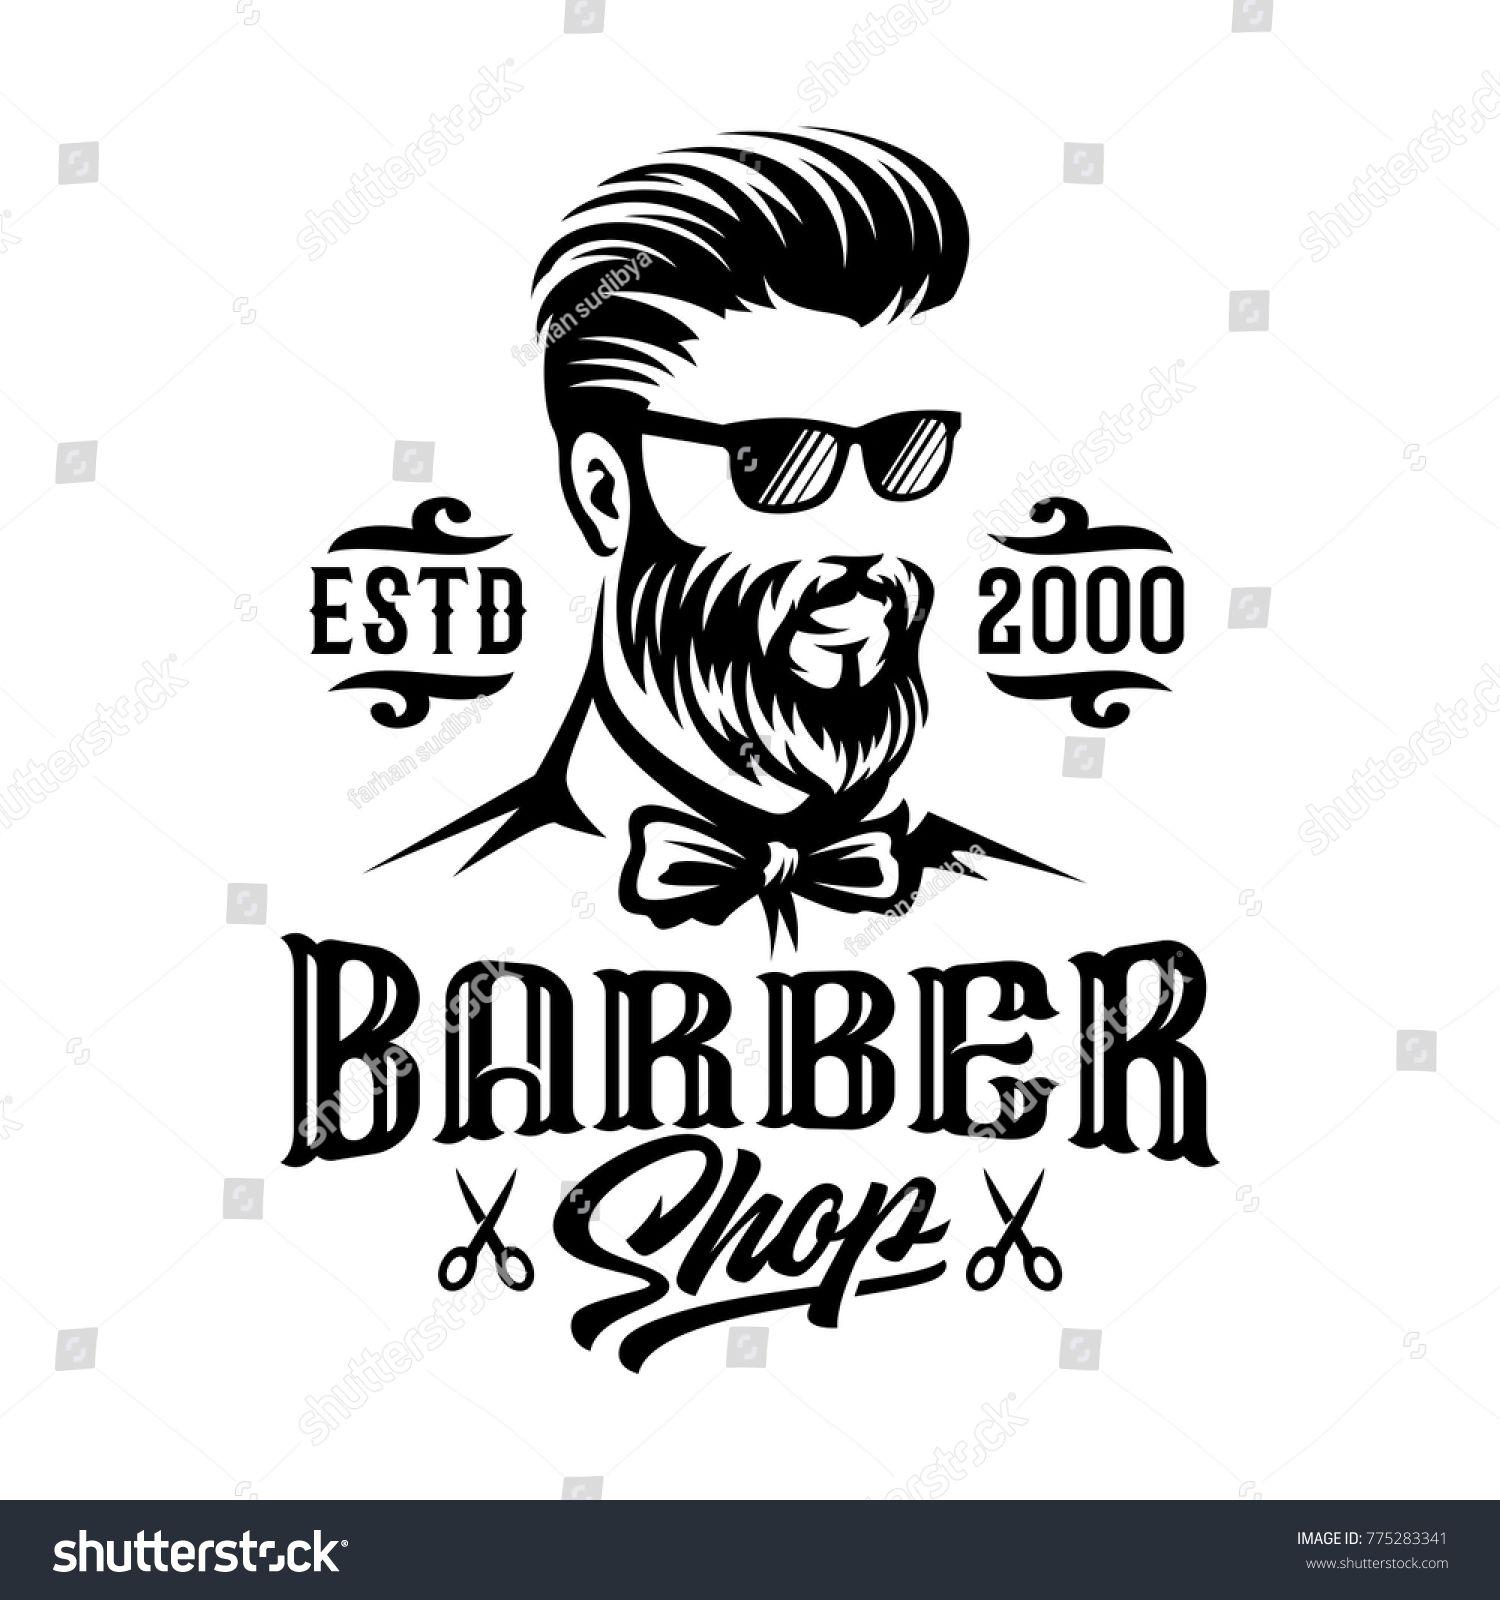 Barbershop Hairstyle Man Label Logo Illustration Man Hairstyle Barbershop Illustration Gambar Desain Gambar Pensil